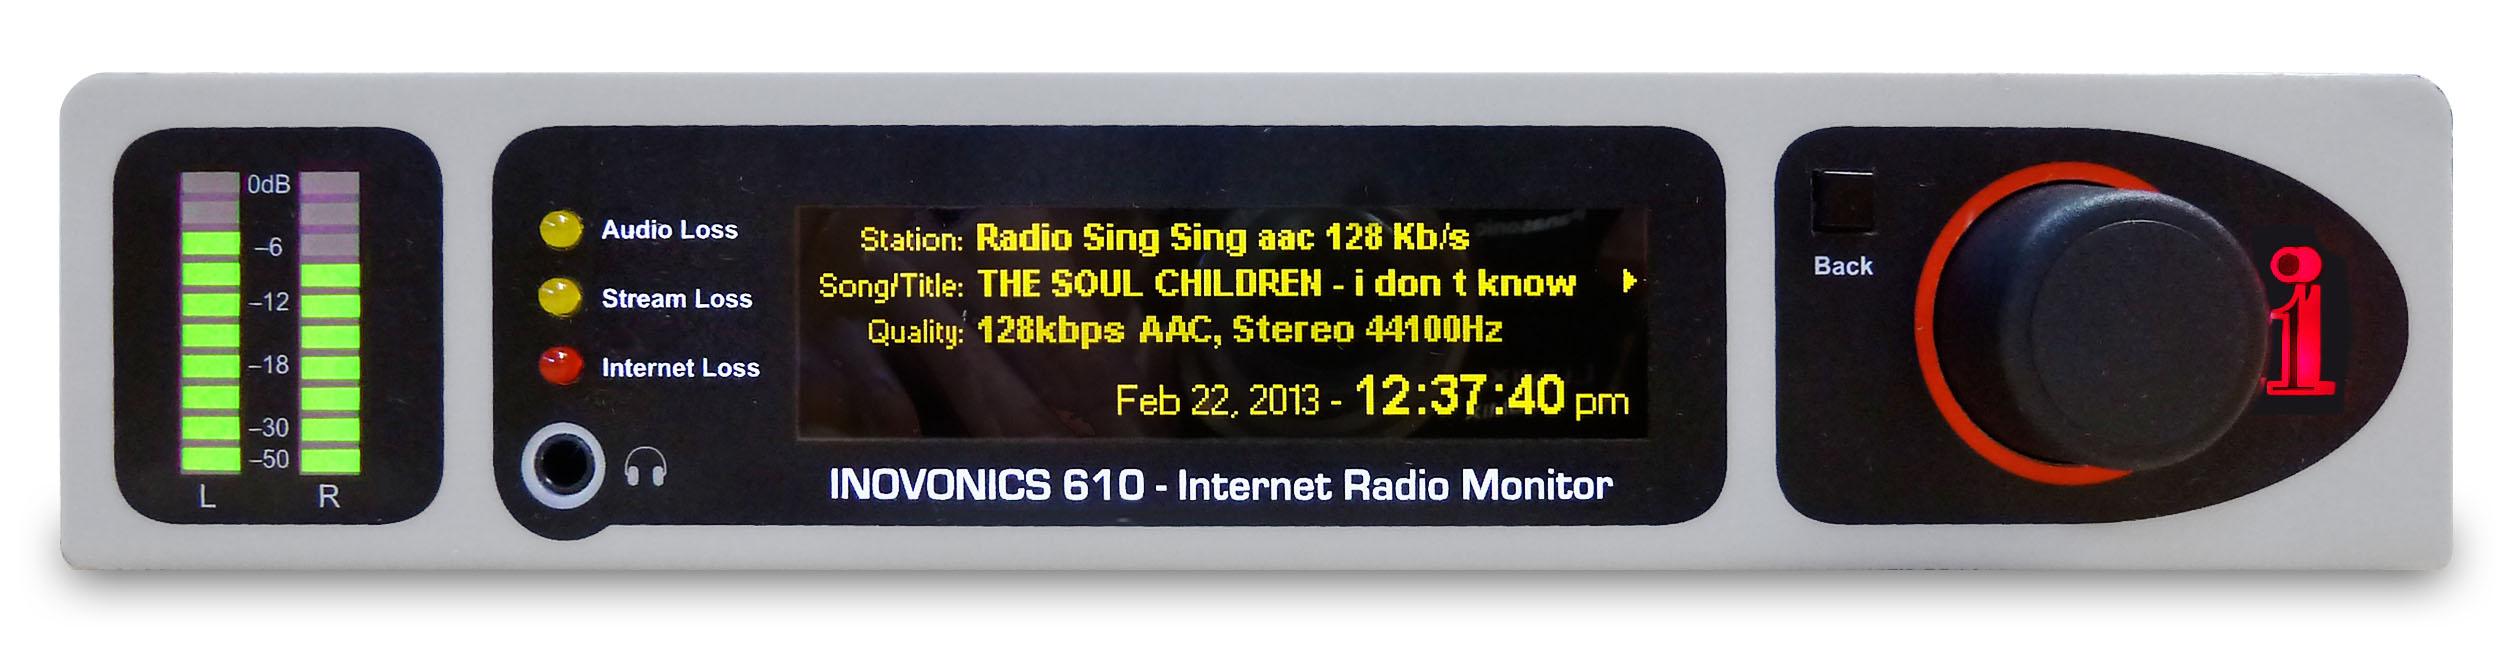 Inovonics610 : un tuner de surveillance pour webradios